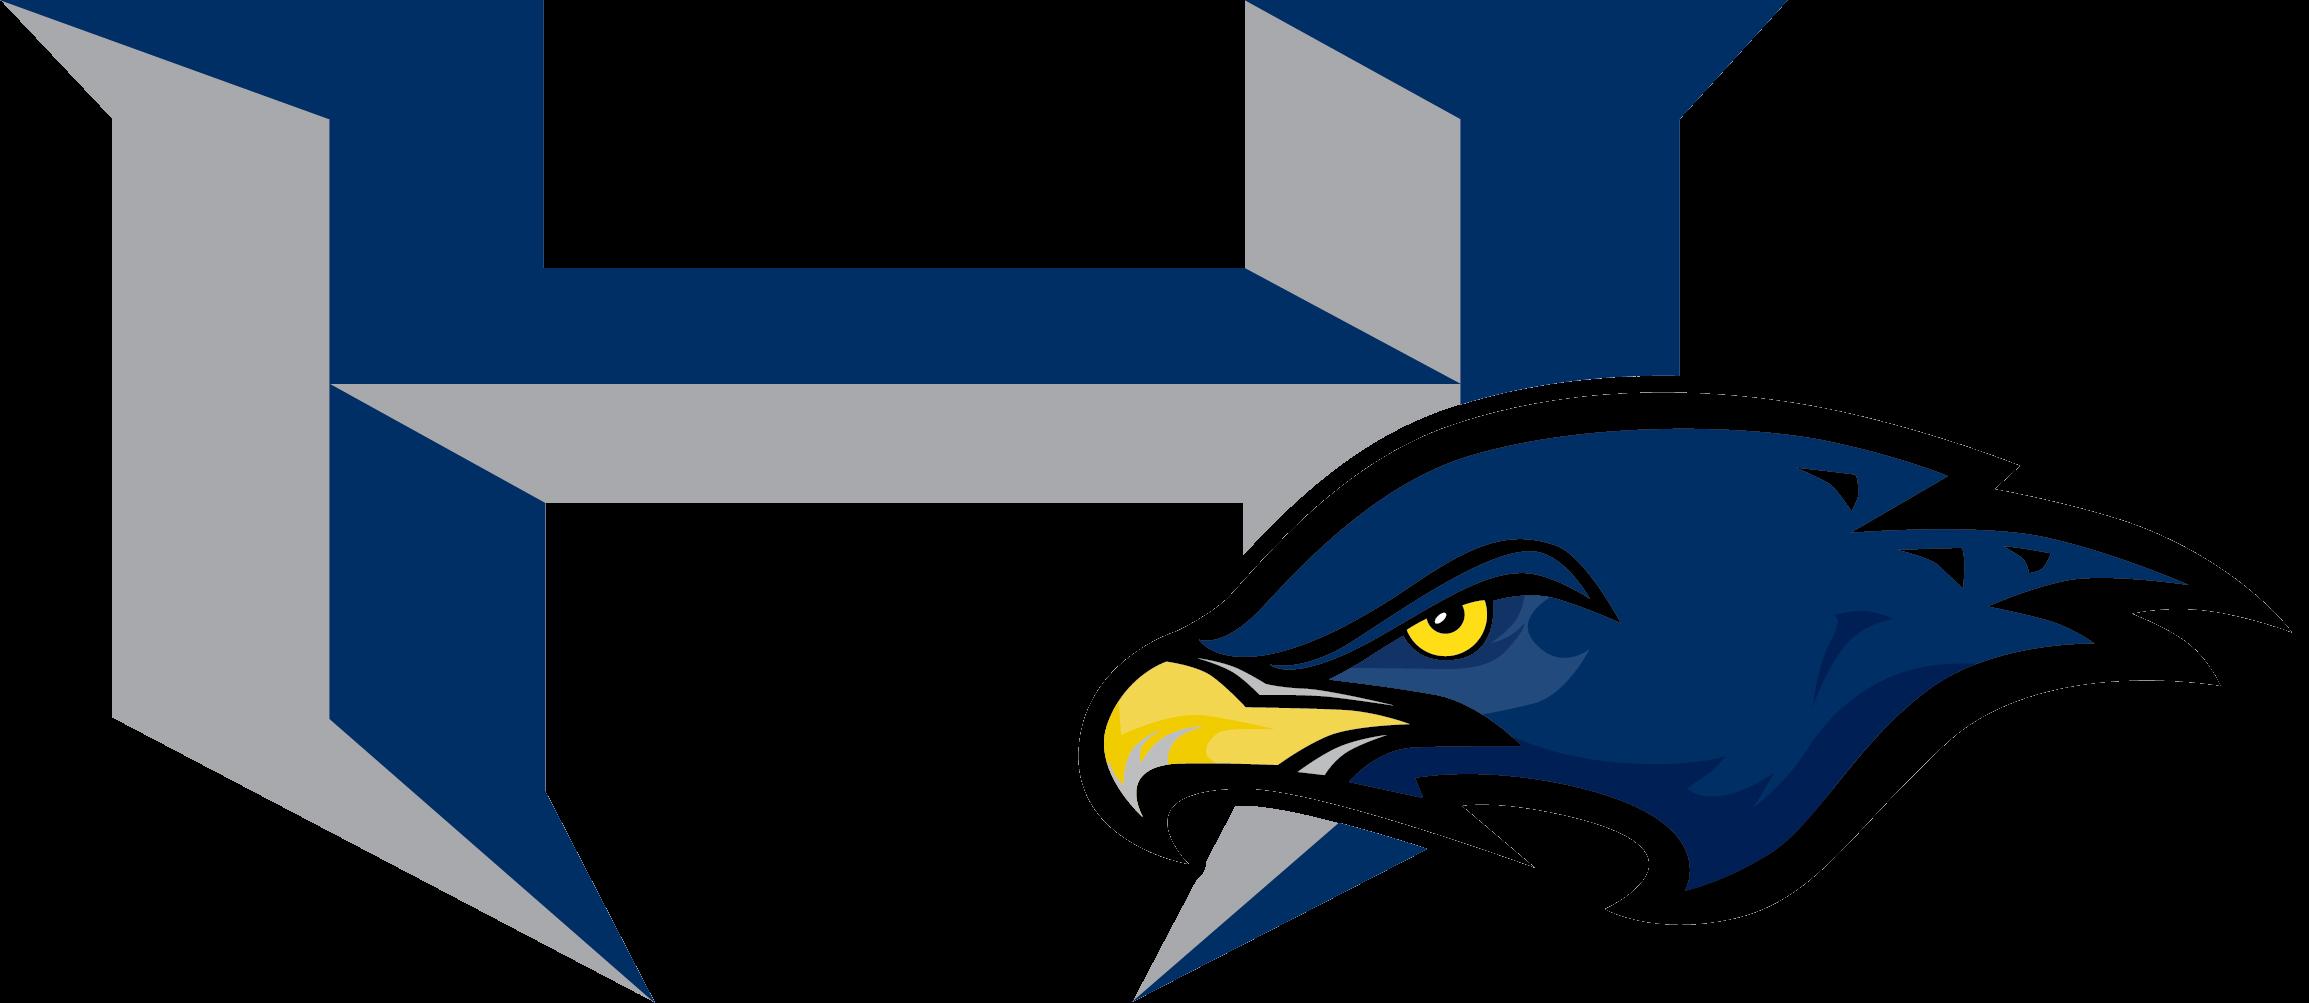 Go hawks football clipart banner freeuse stock Hendrickson Hawks banner freeuse stock